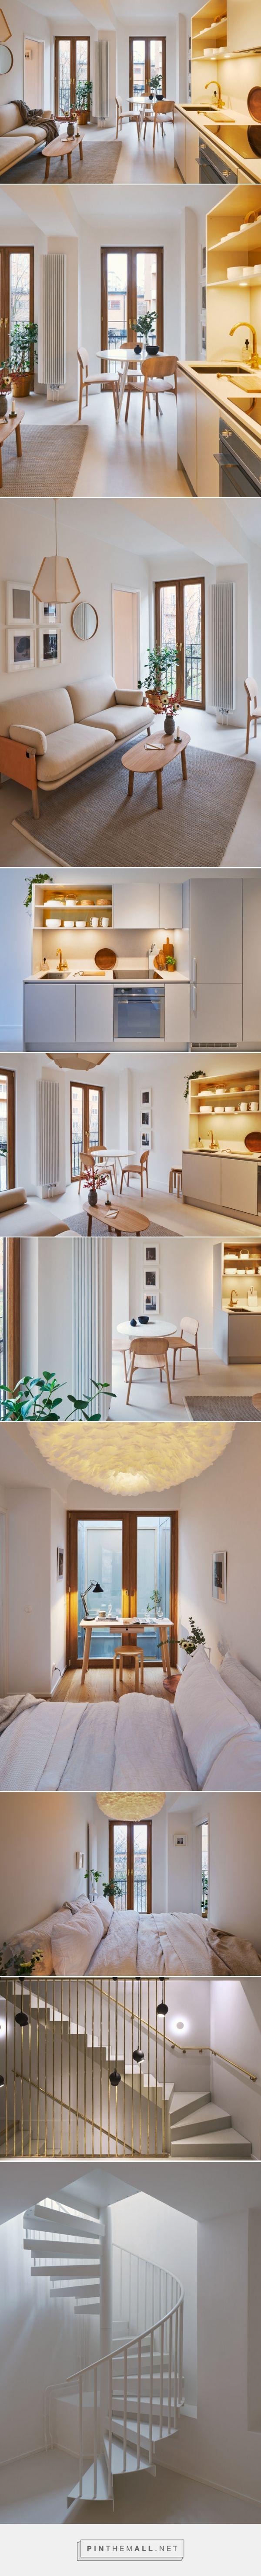 monica förster and andreas martin-löf convert stockholm cinema into luxury flats - created via https://pinthemall.net